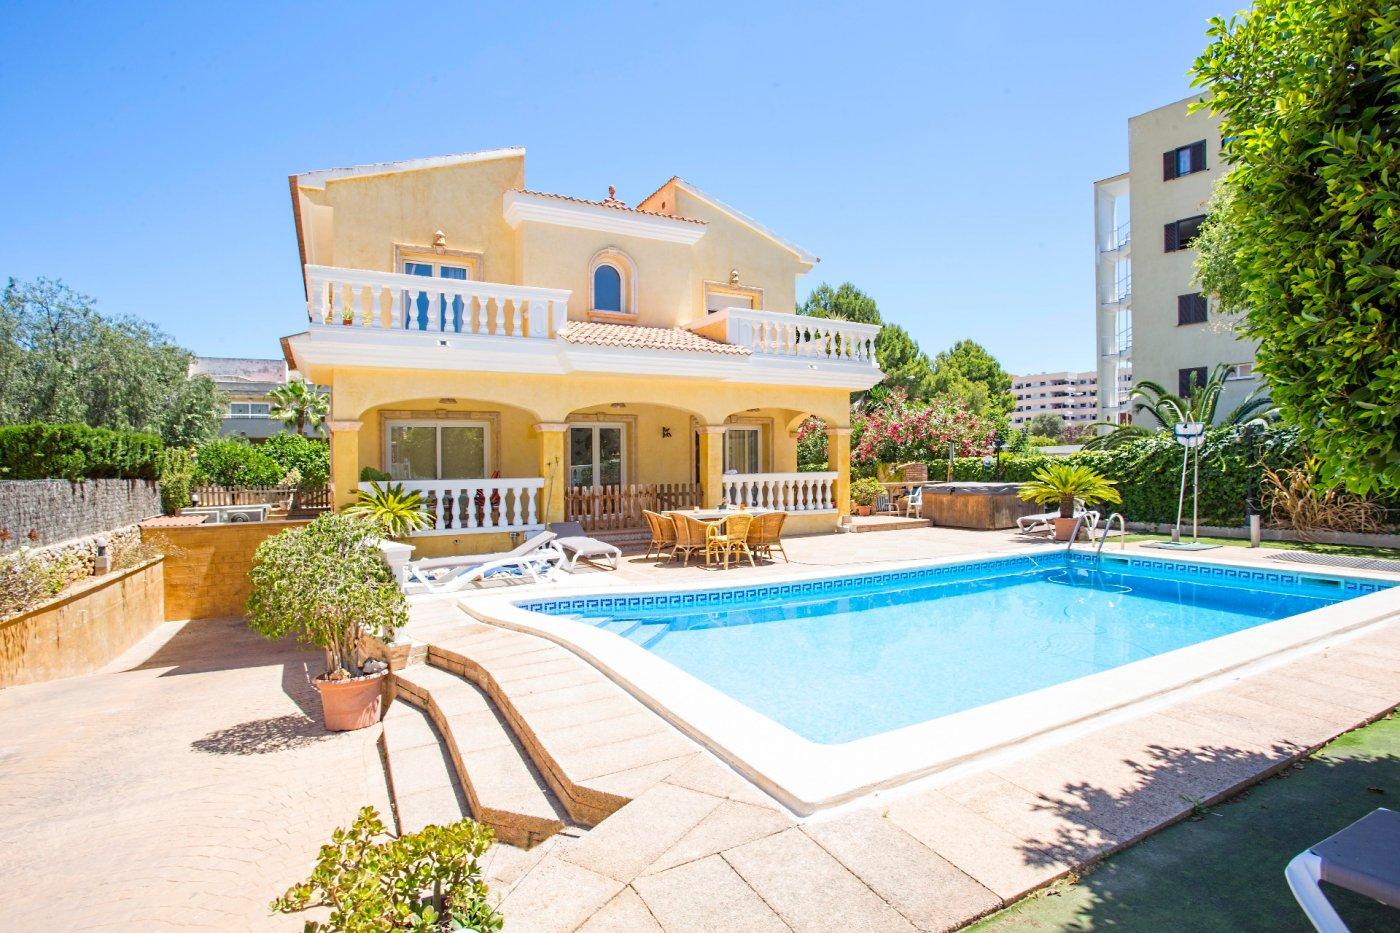 Espectacular casa muy espacioasa con piscina en una zona popular de palmanova